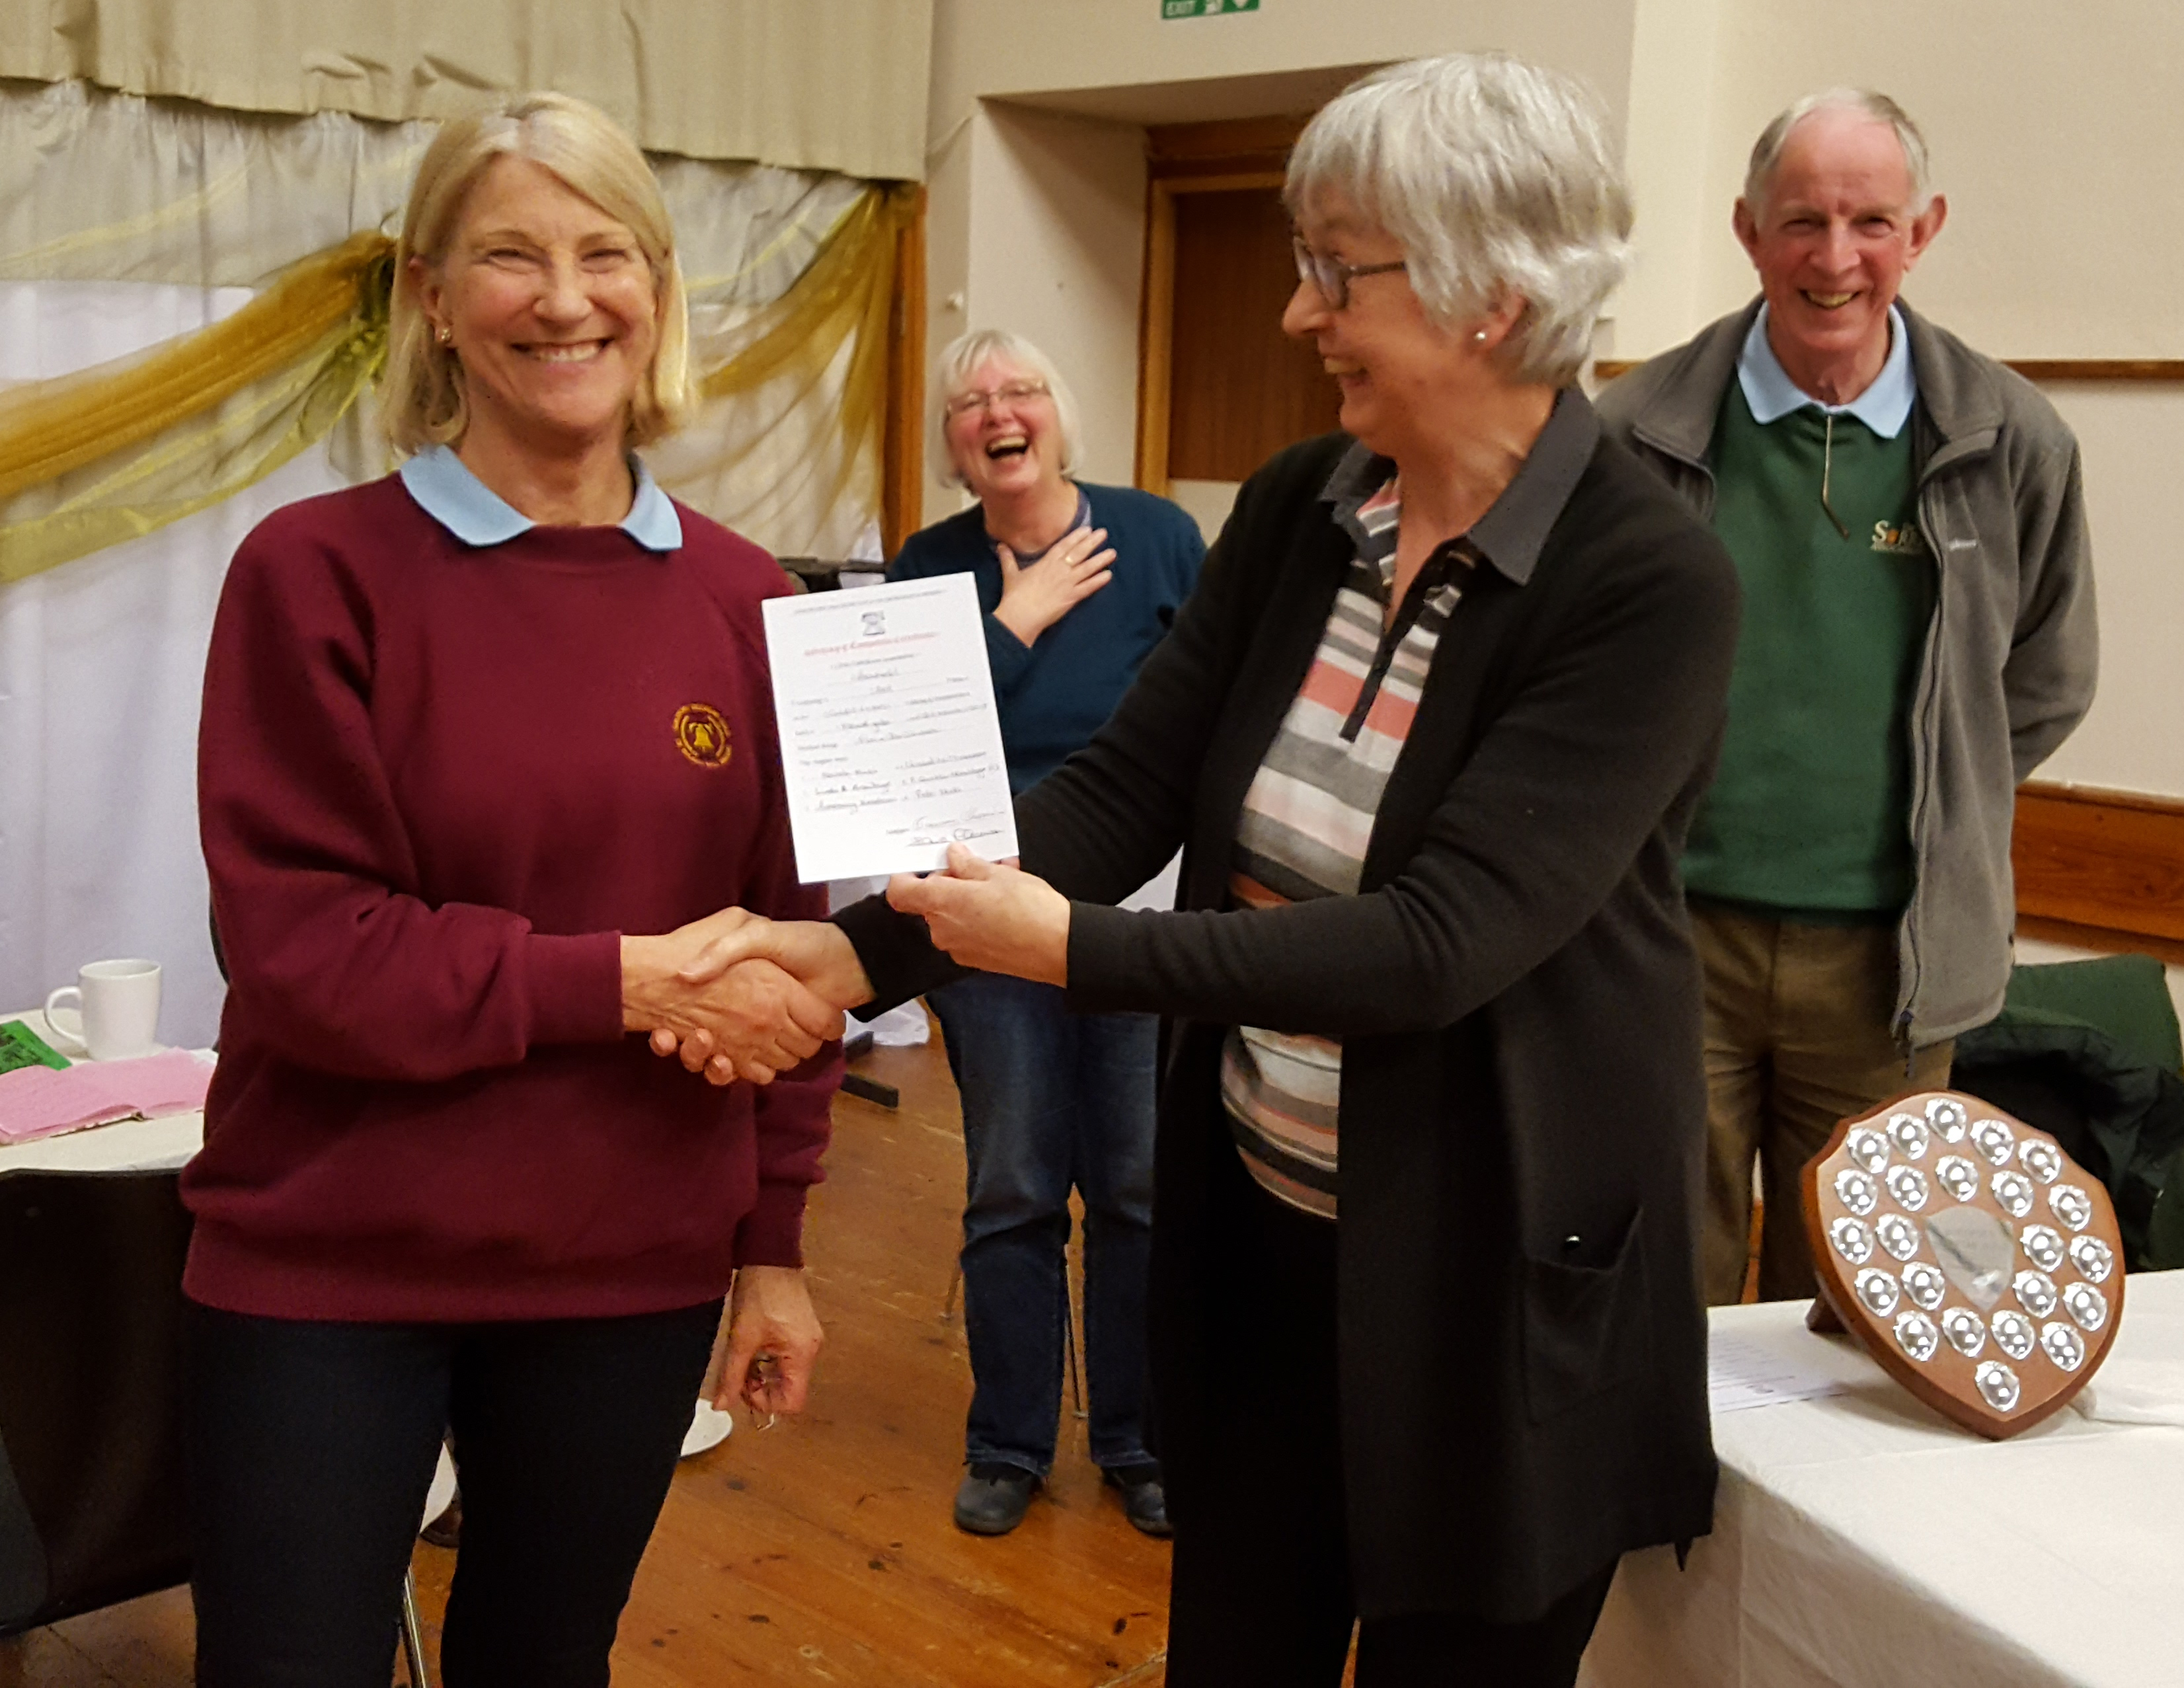 Rosemary Henderson receiving certificate on behalf of Ashtead